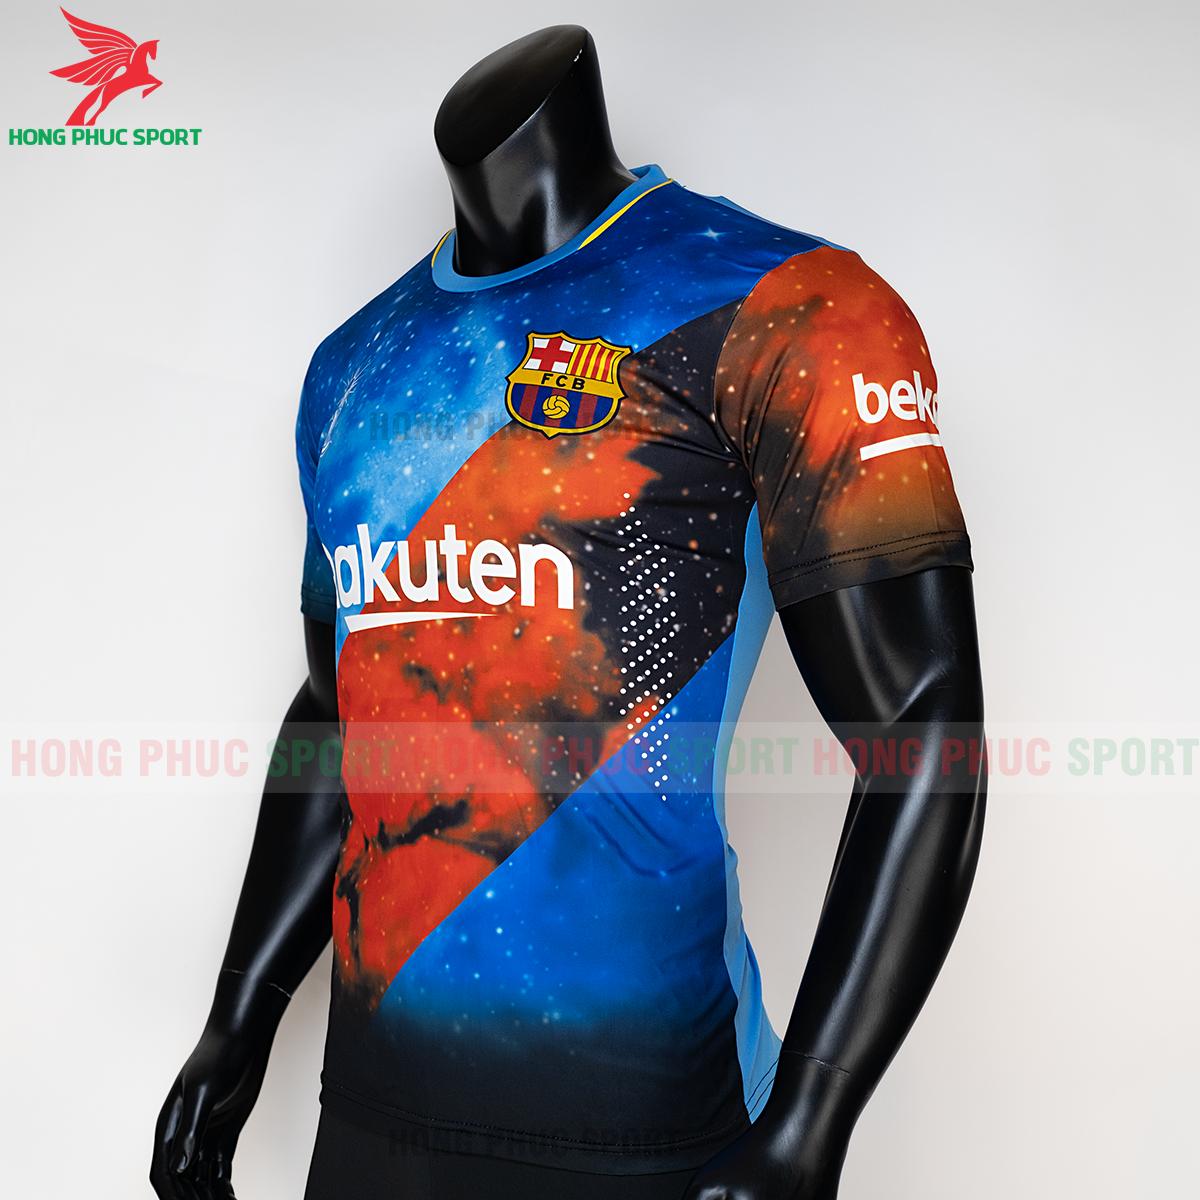 https://cdn.hongphucsport.com/unsafe/s4.shopbay.vn/files/285/ao-barcelona-2020-phien-ban-fan-4-5f7307aaefef4.png